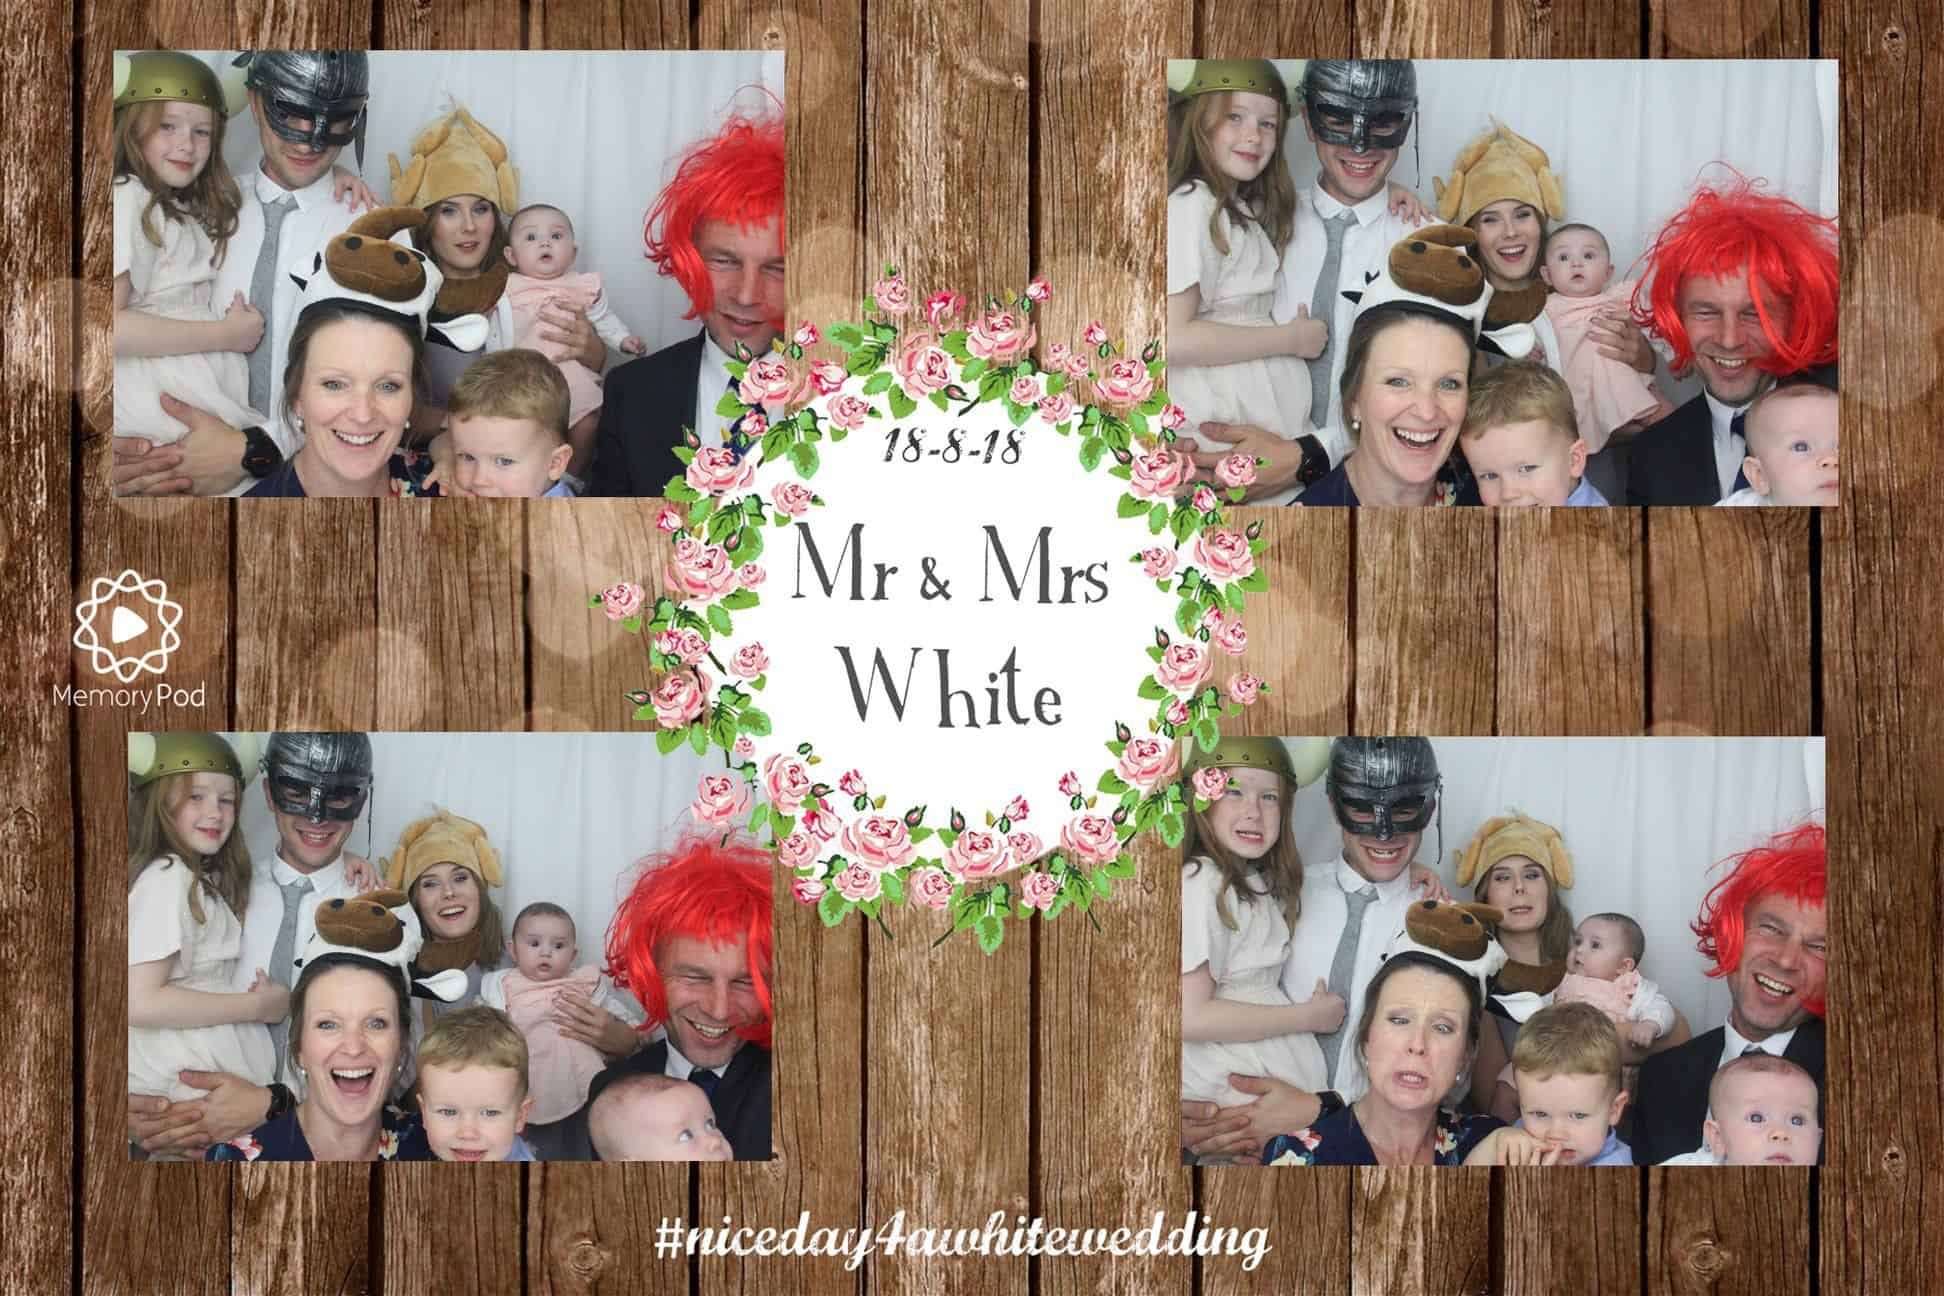 Mr and Mrs White Wedding.jpg